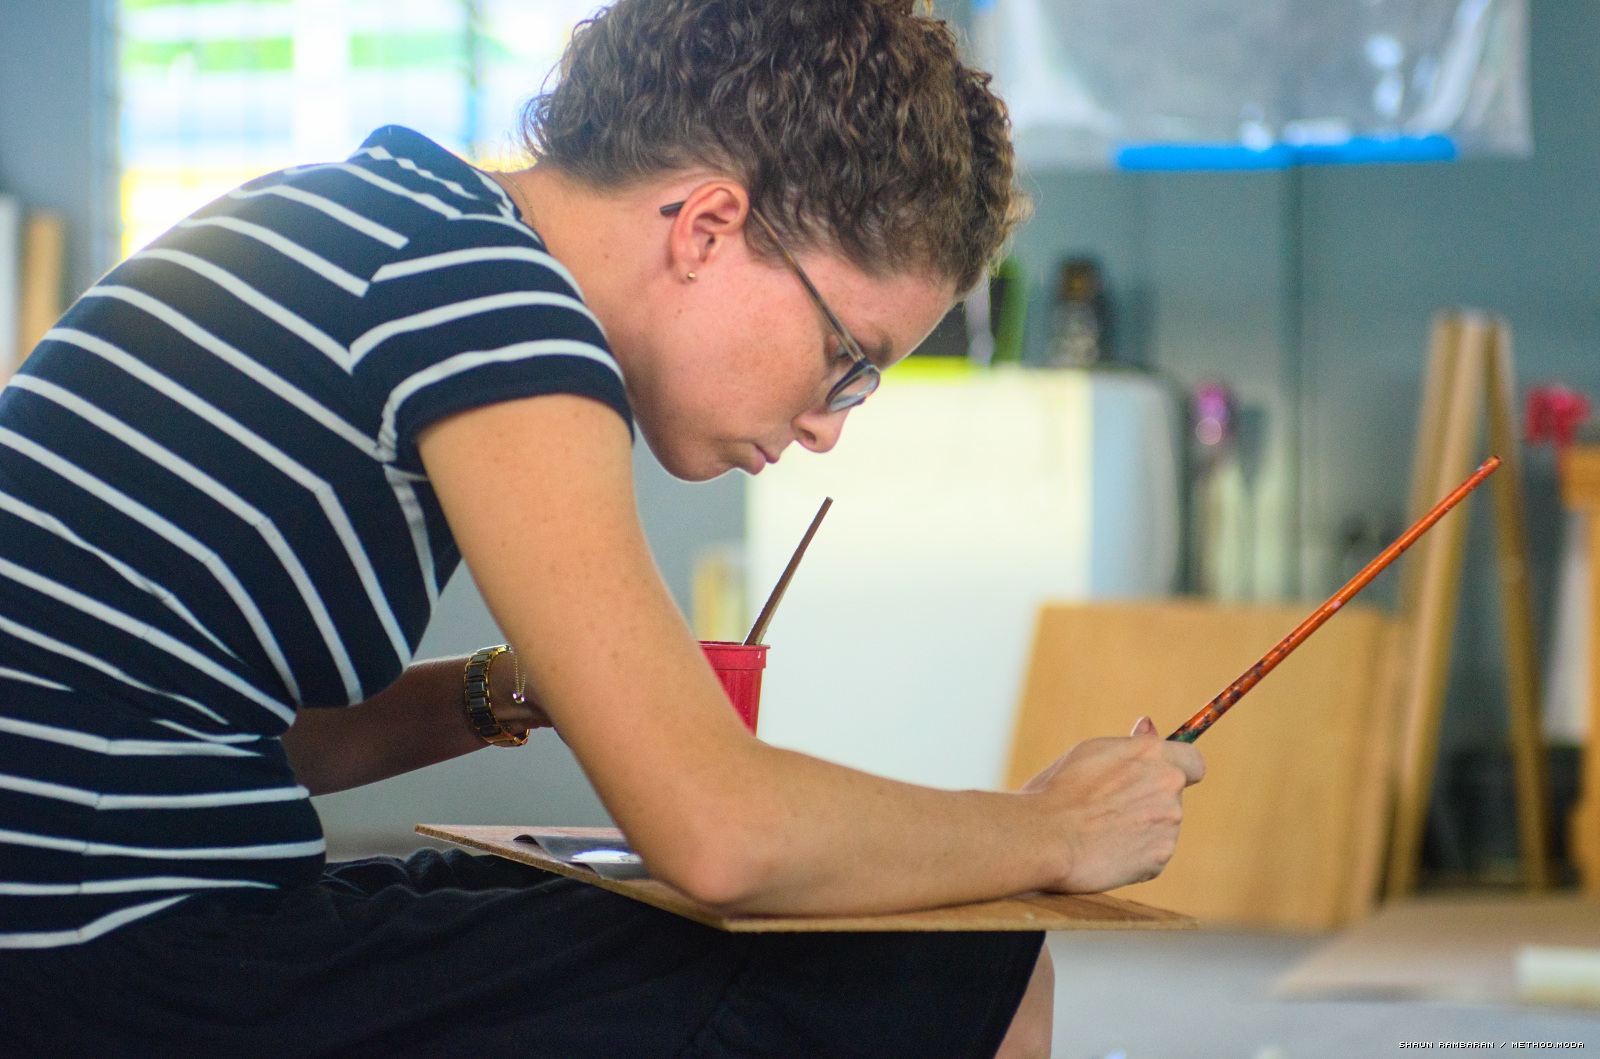 Alicia Milne at '200 Drawings'